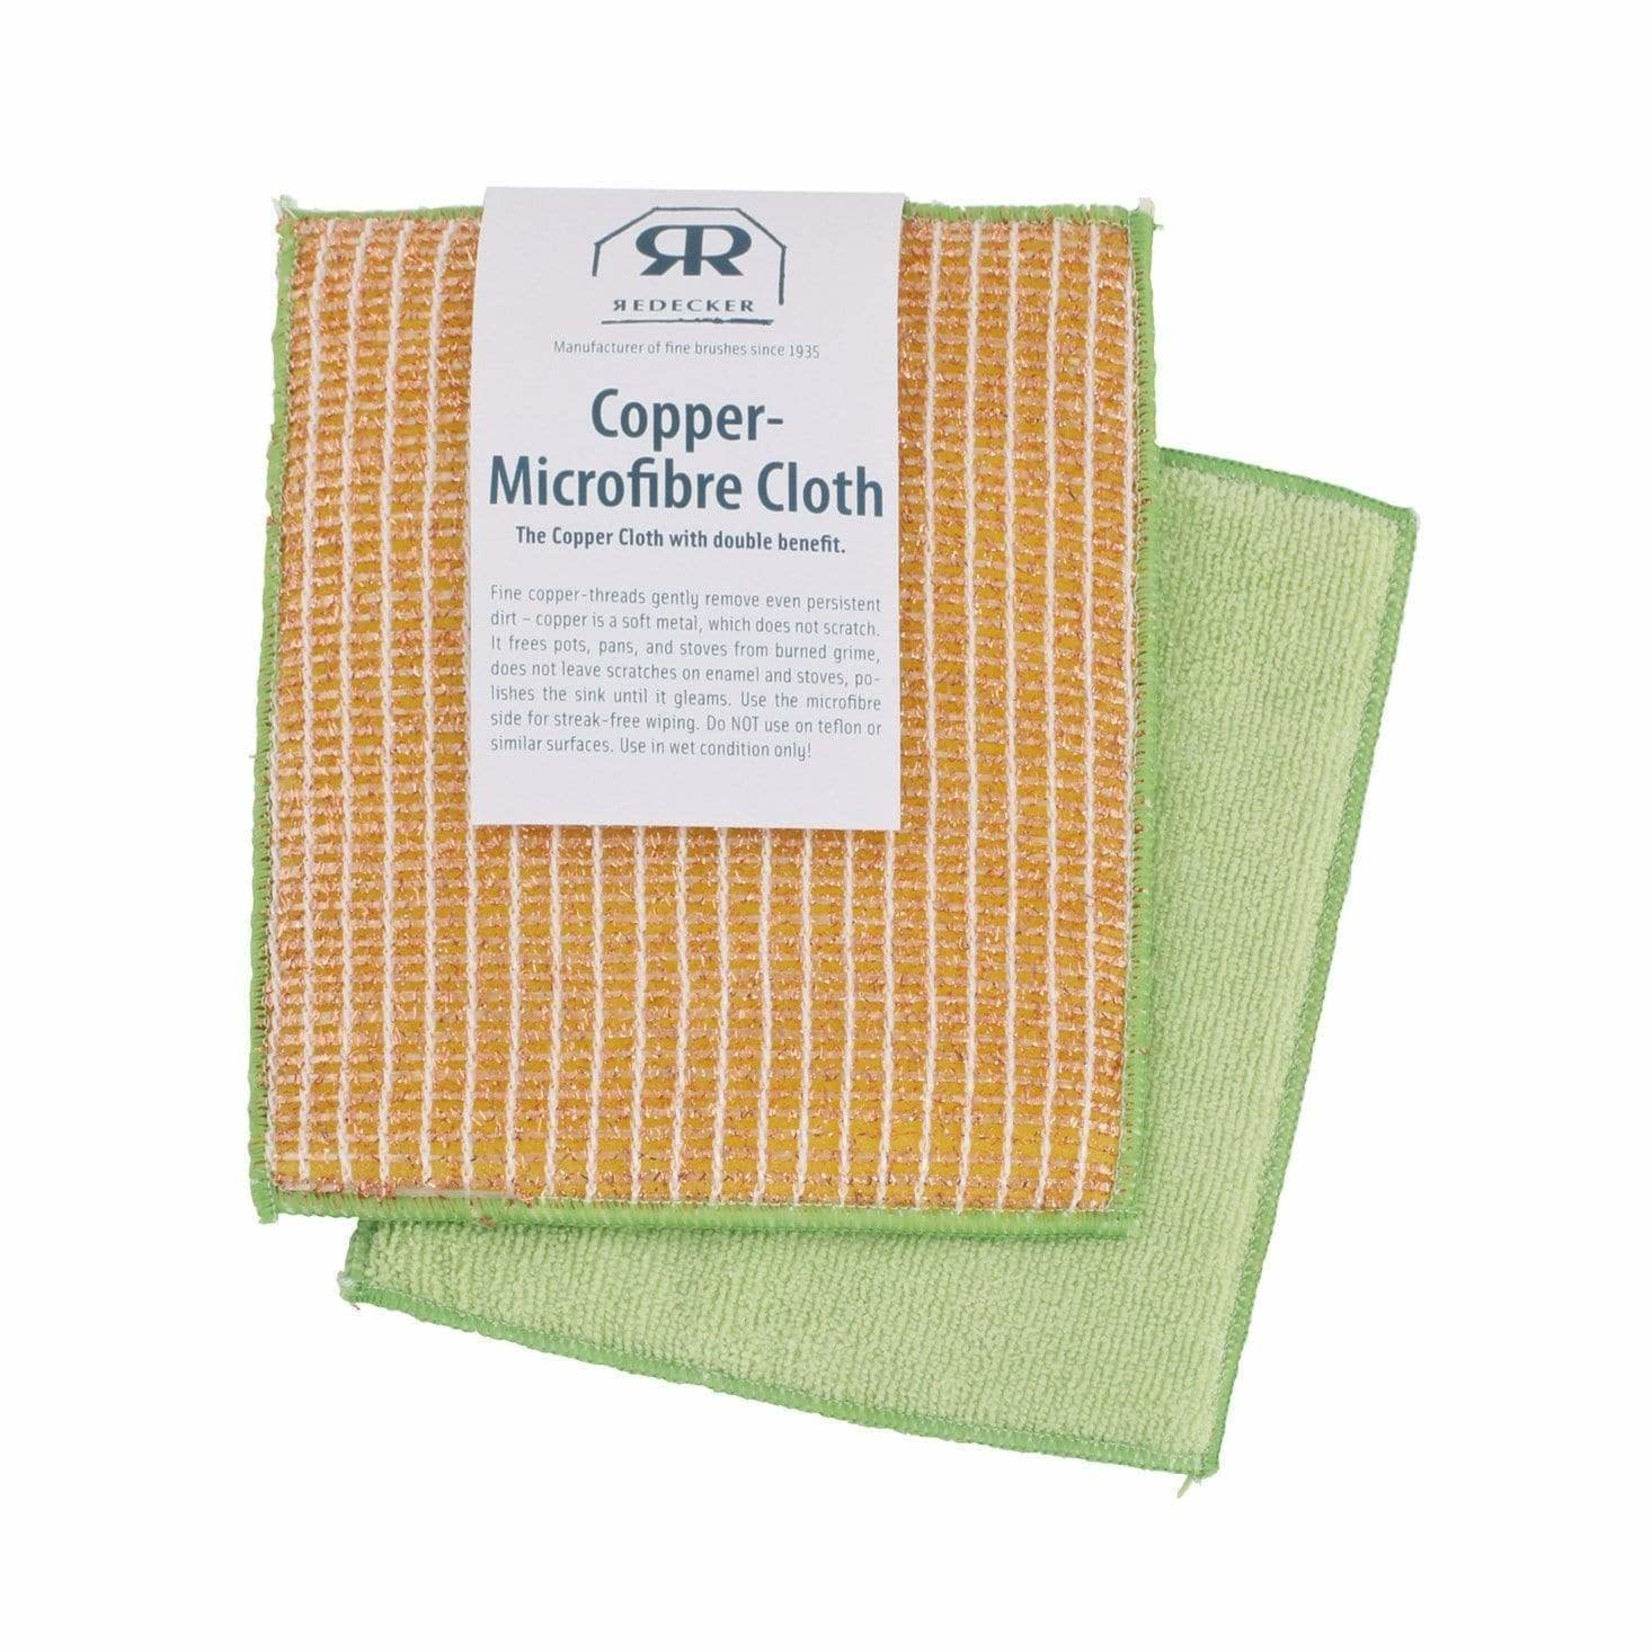 Redecker Redecker Copper-Microfibre Cloth